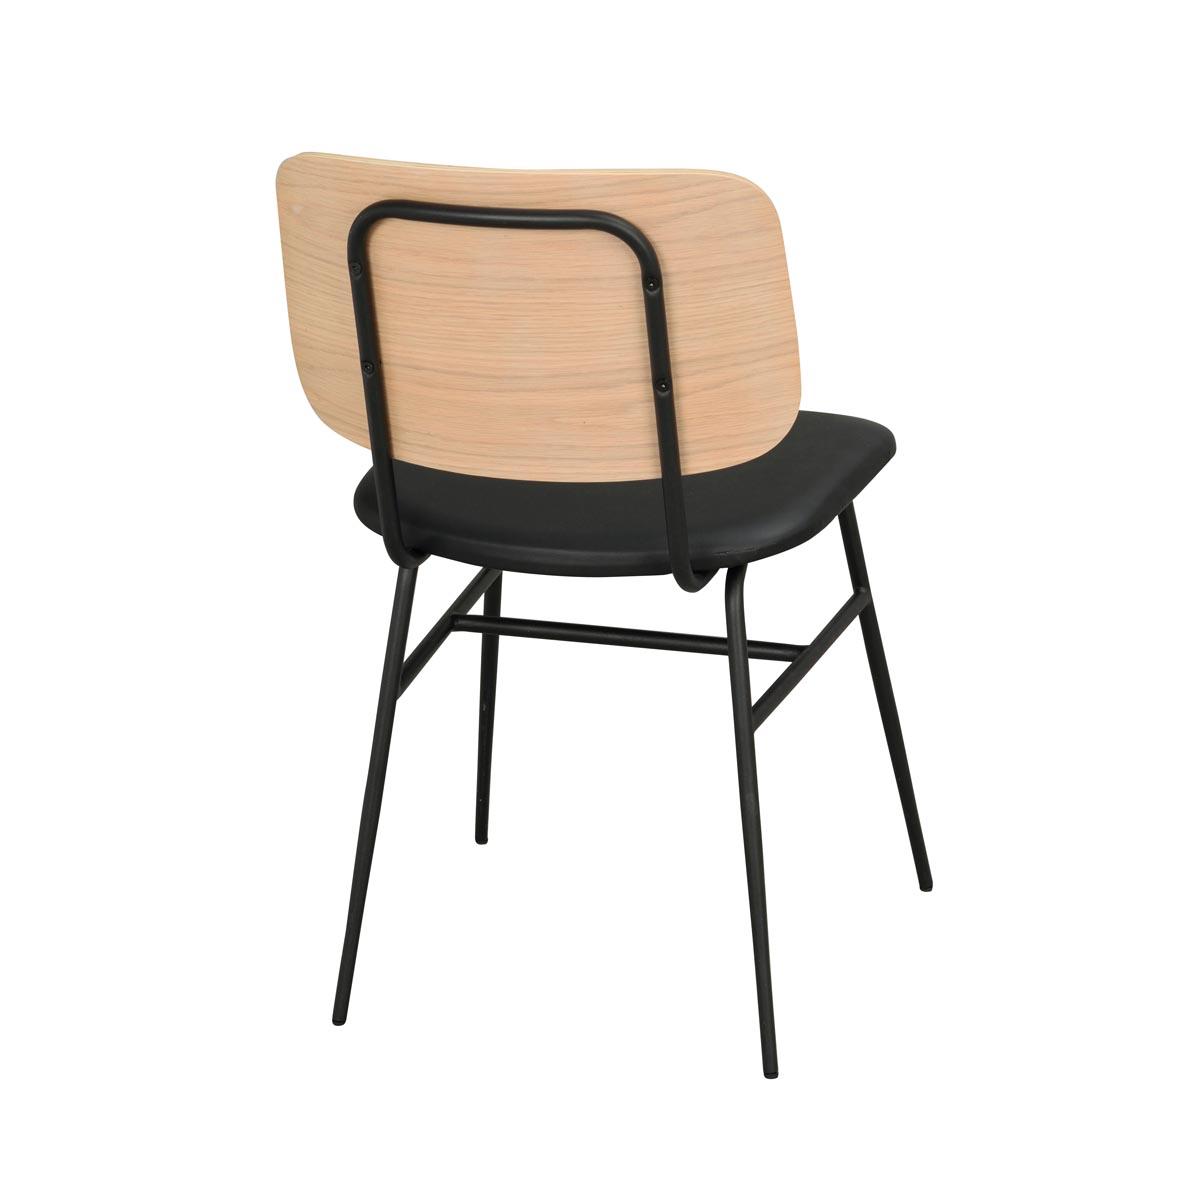 Brent-stol-vitpigm_svartR-118980_d